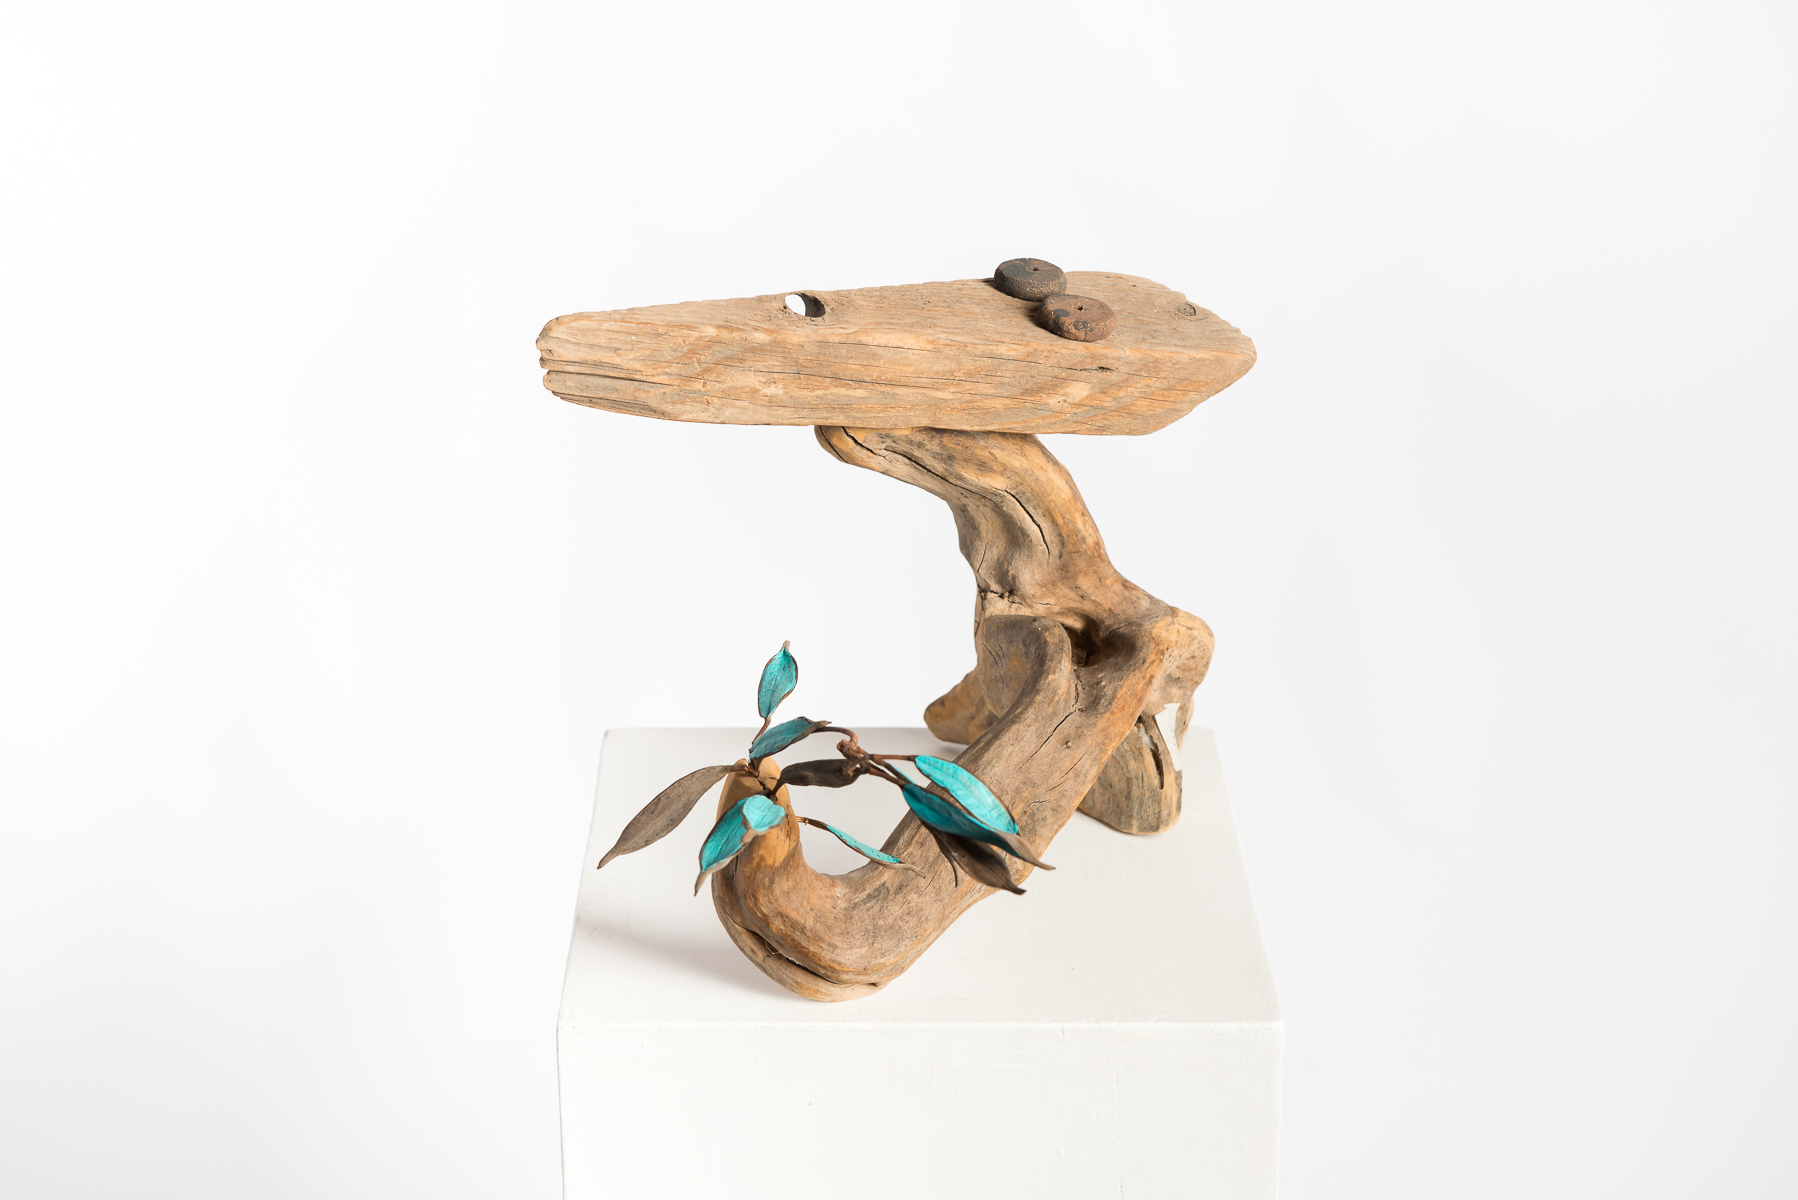 Driftwood creature